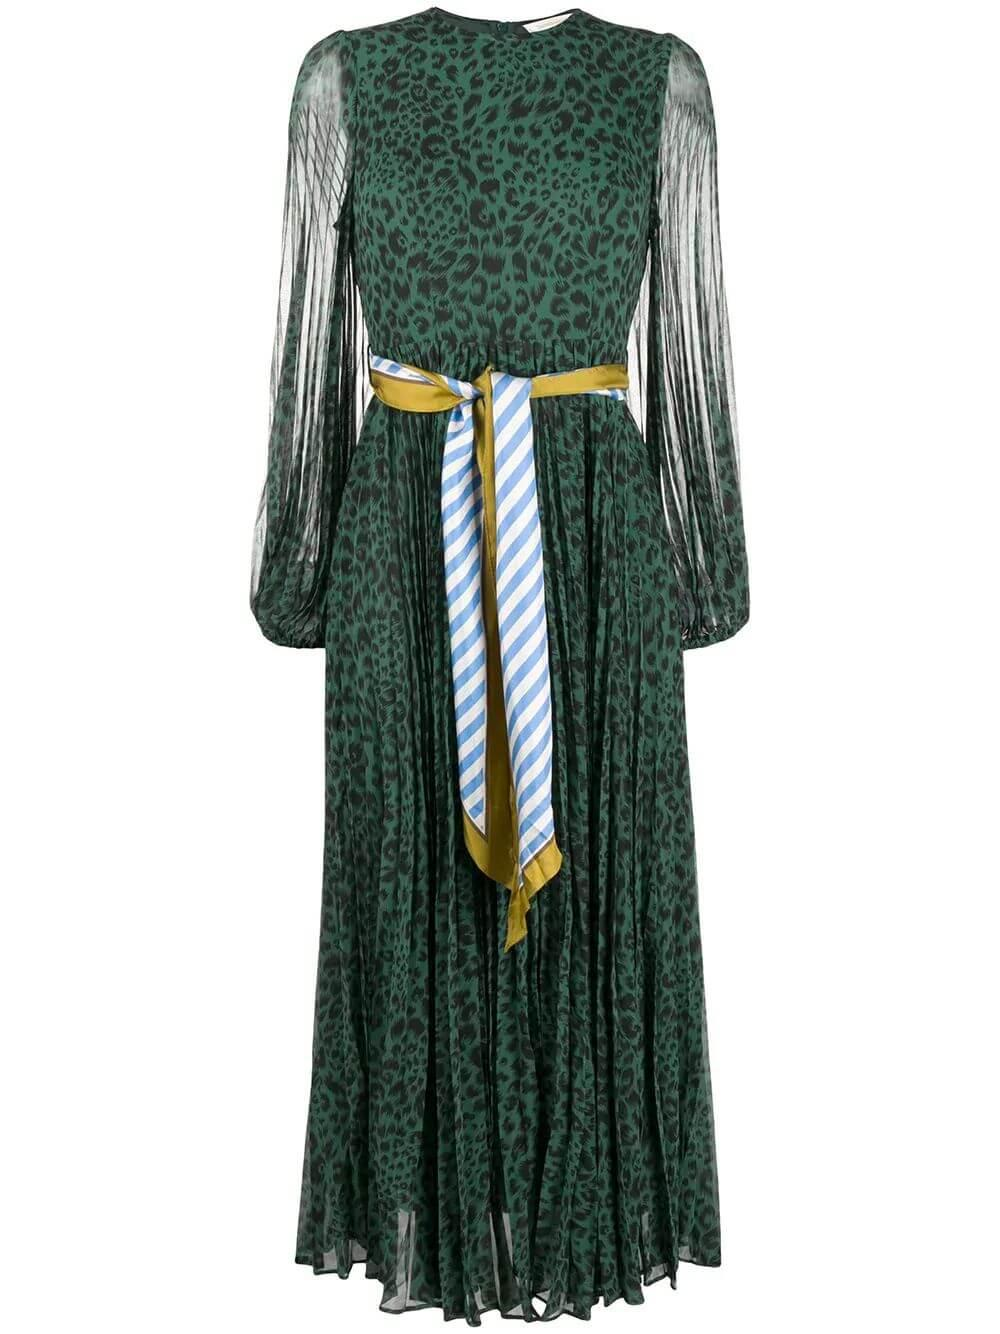 Sunray Midi Dress Item # 7631DRLAD